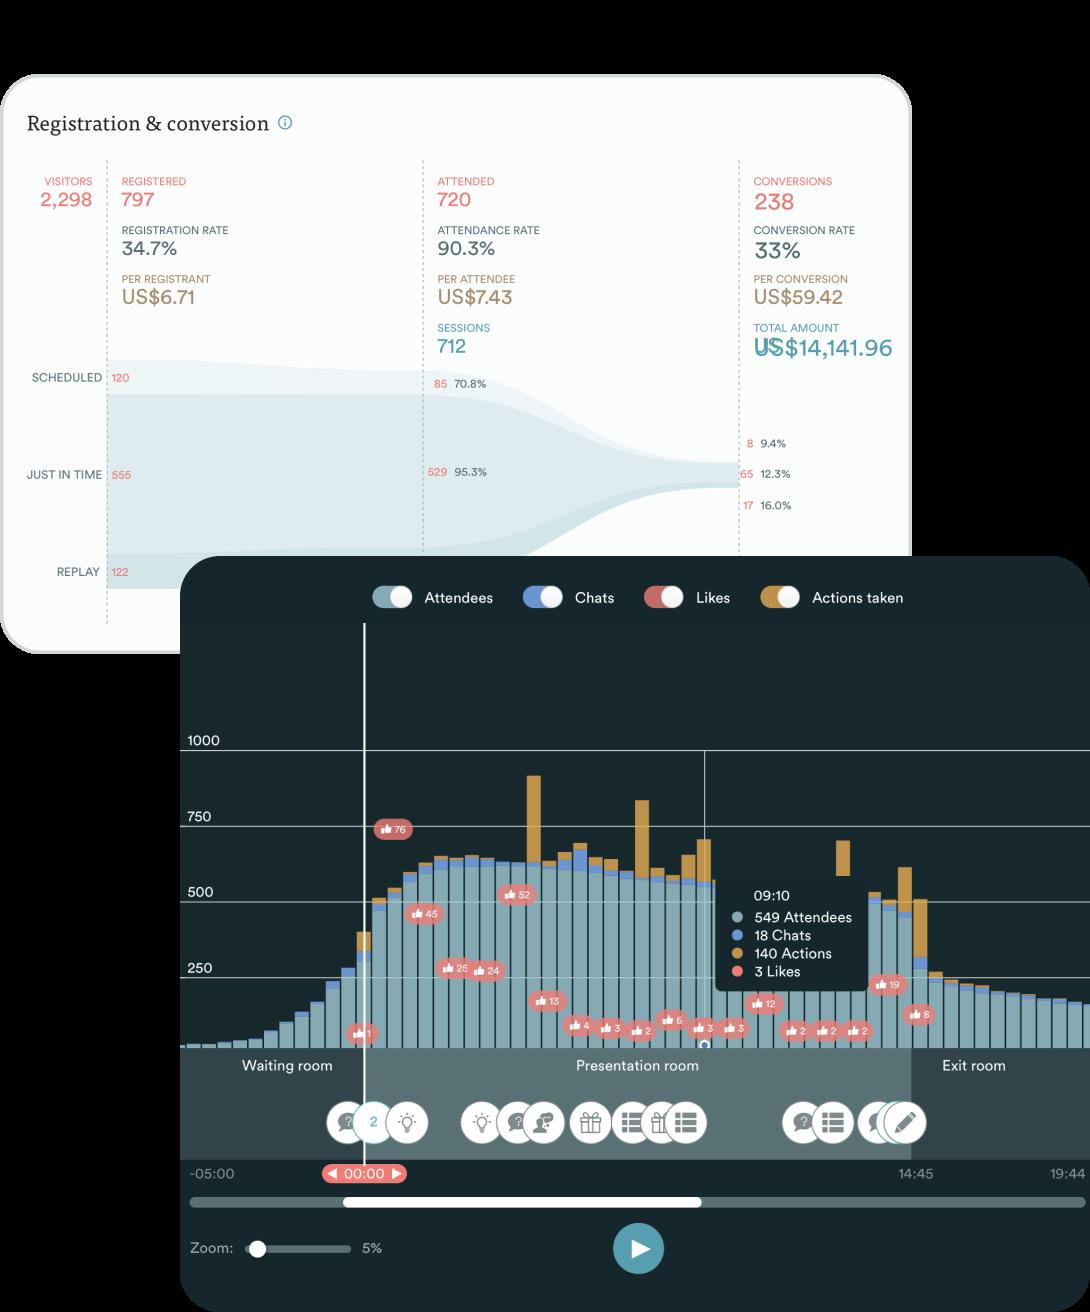 eWebinar analytics engagement and conversion graph